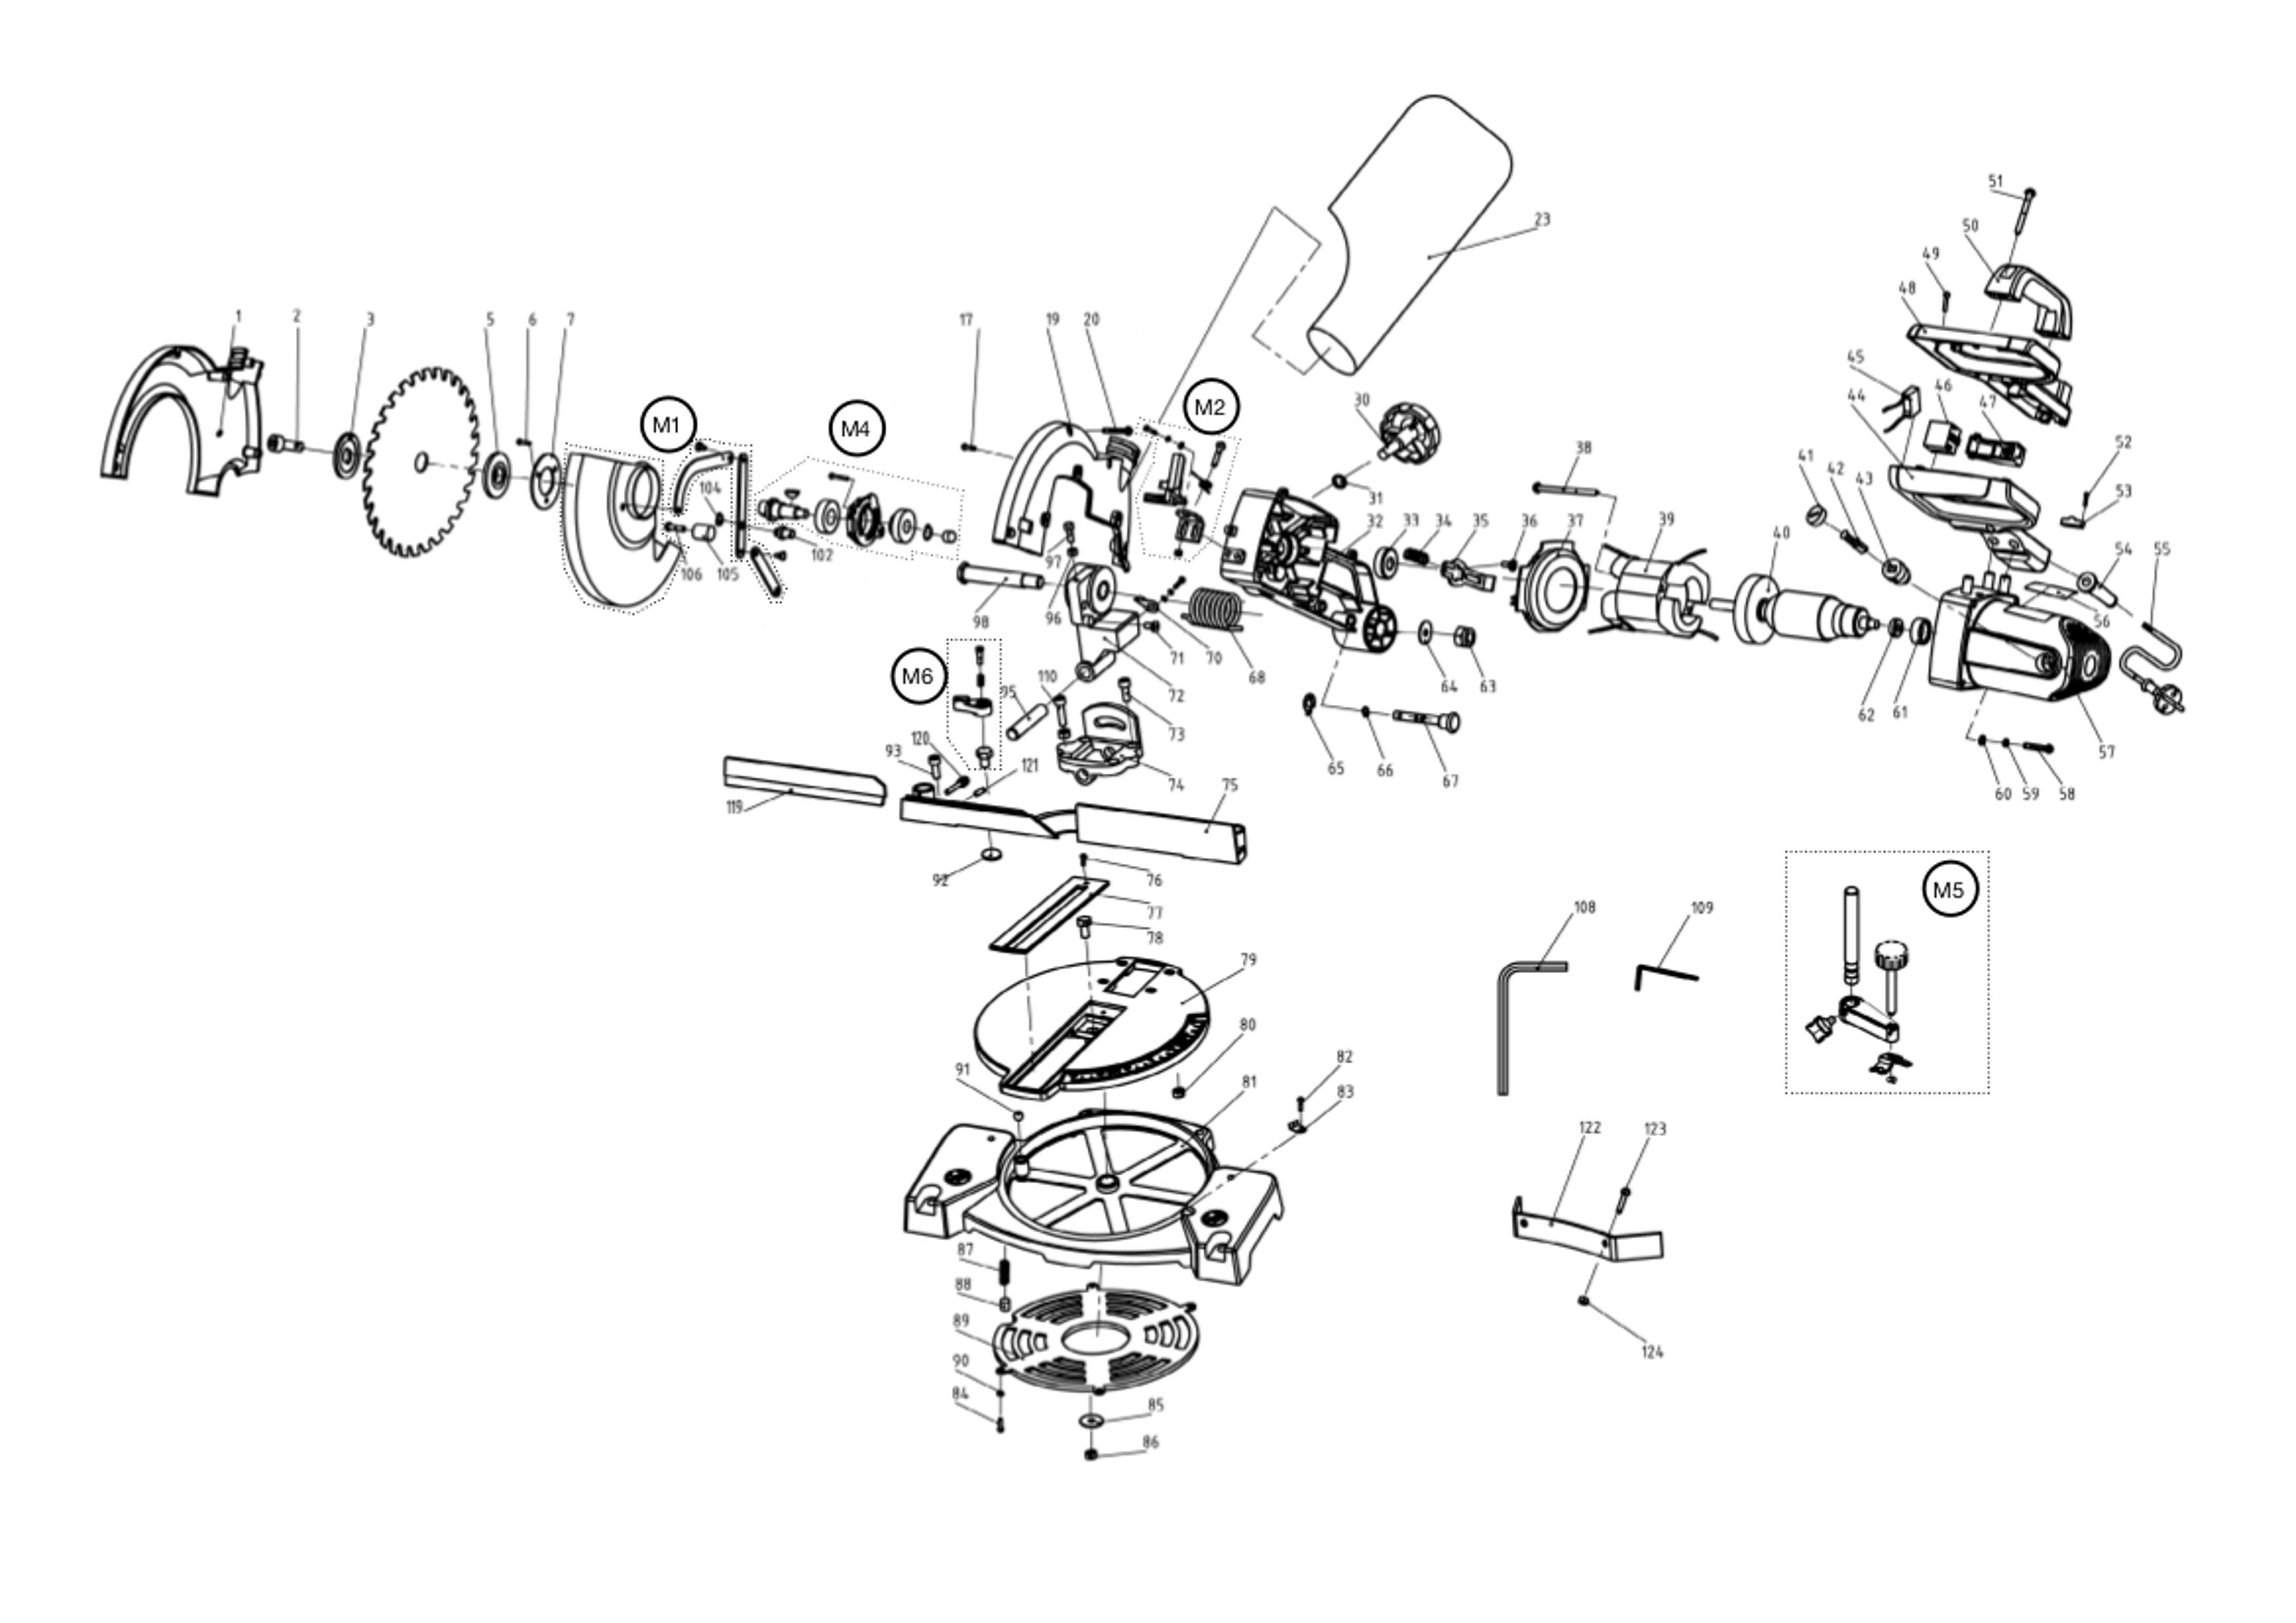 Spares For Evolution Rage3 B 240v 210mm Tct Multipurpose Compound Mitre Saw Spare Parts Spare